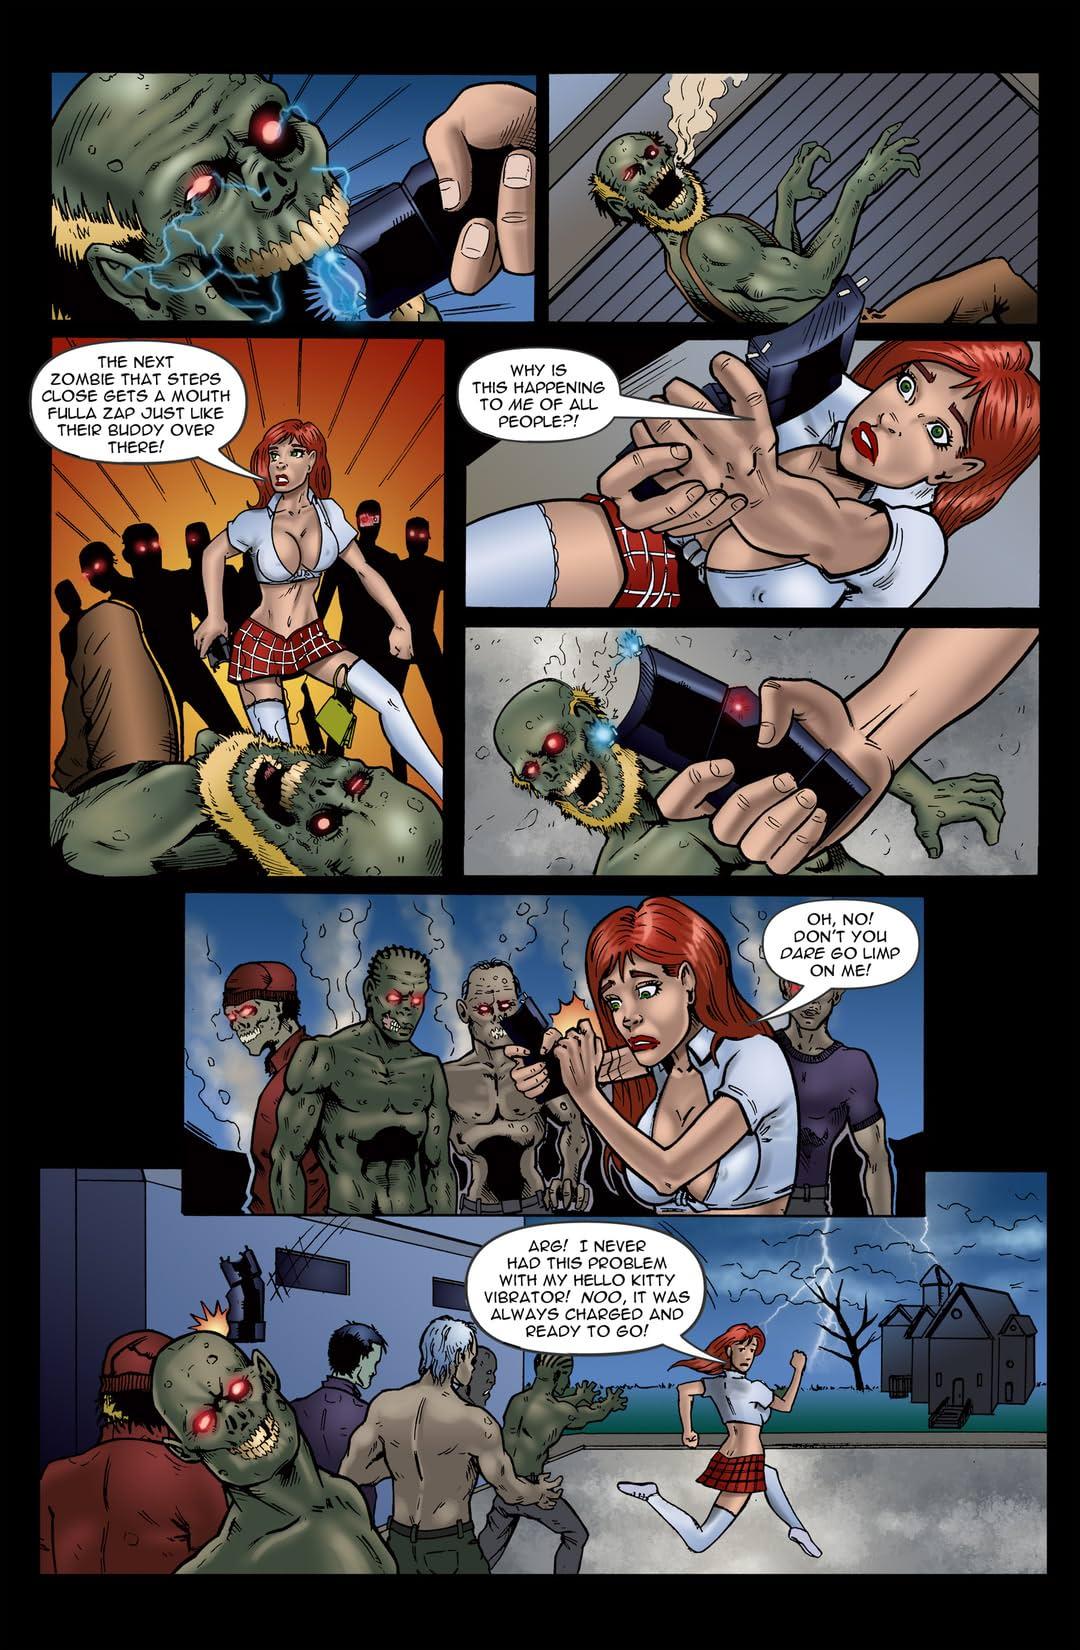 Chaos Campus: Sorority Girls vs. Zombies #7